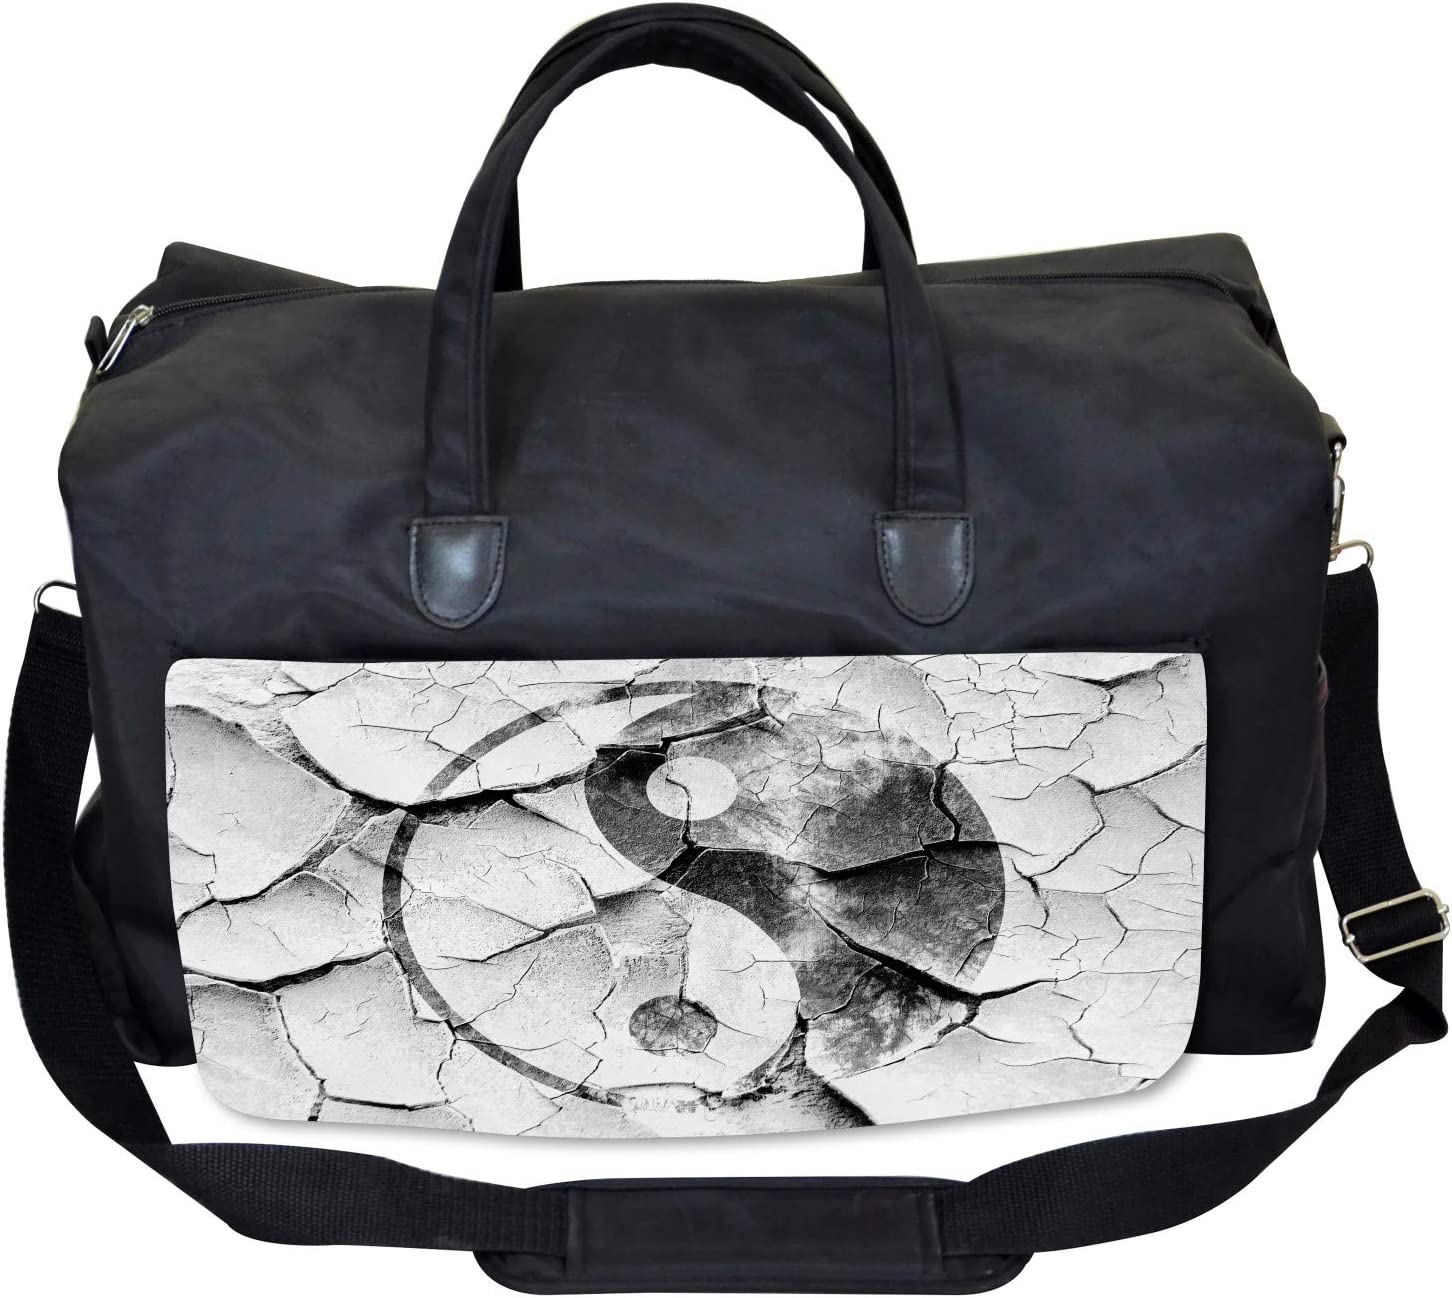 Large Weekender Carry-on Ambesonne Zen Gym Bag Ying Yang Grunge Display